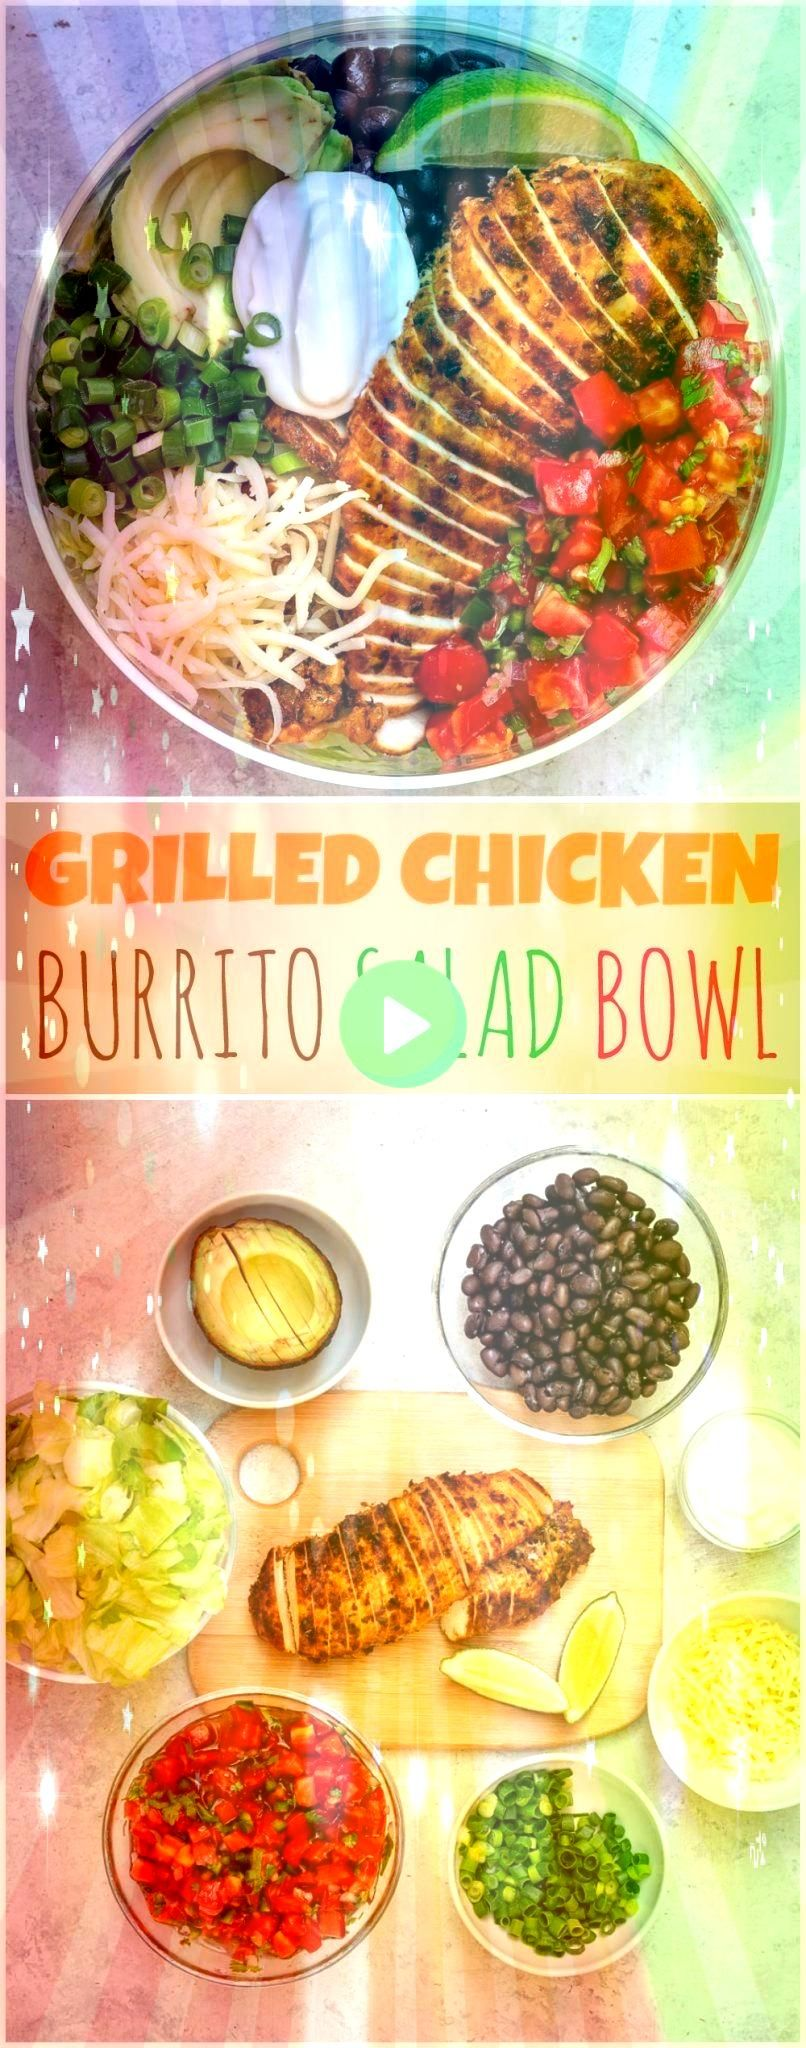 Chicken Meal Prep Bowls 4 Creative Ways for Clean Eating  Clean Food CrushGrilled Chicken Meal Prep Bowls 4 Creative Ways for Clean Eating  Clean Food Crush Healthy Greek...